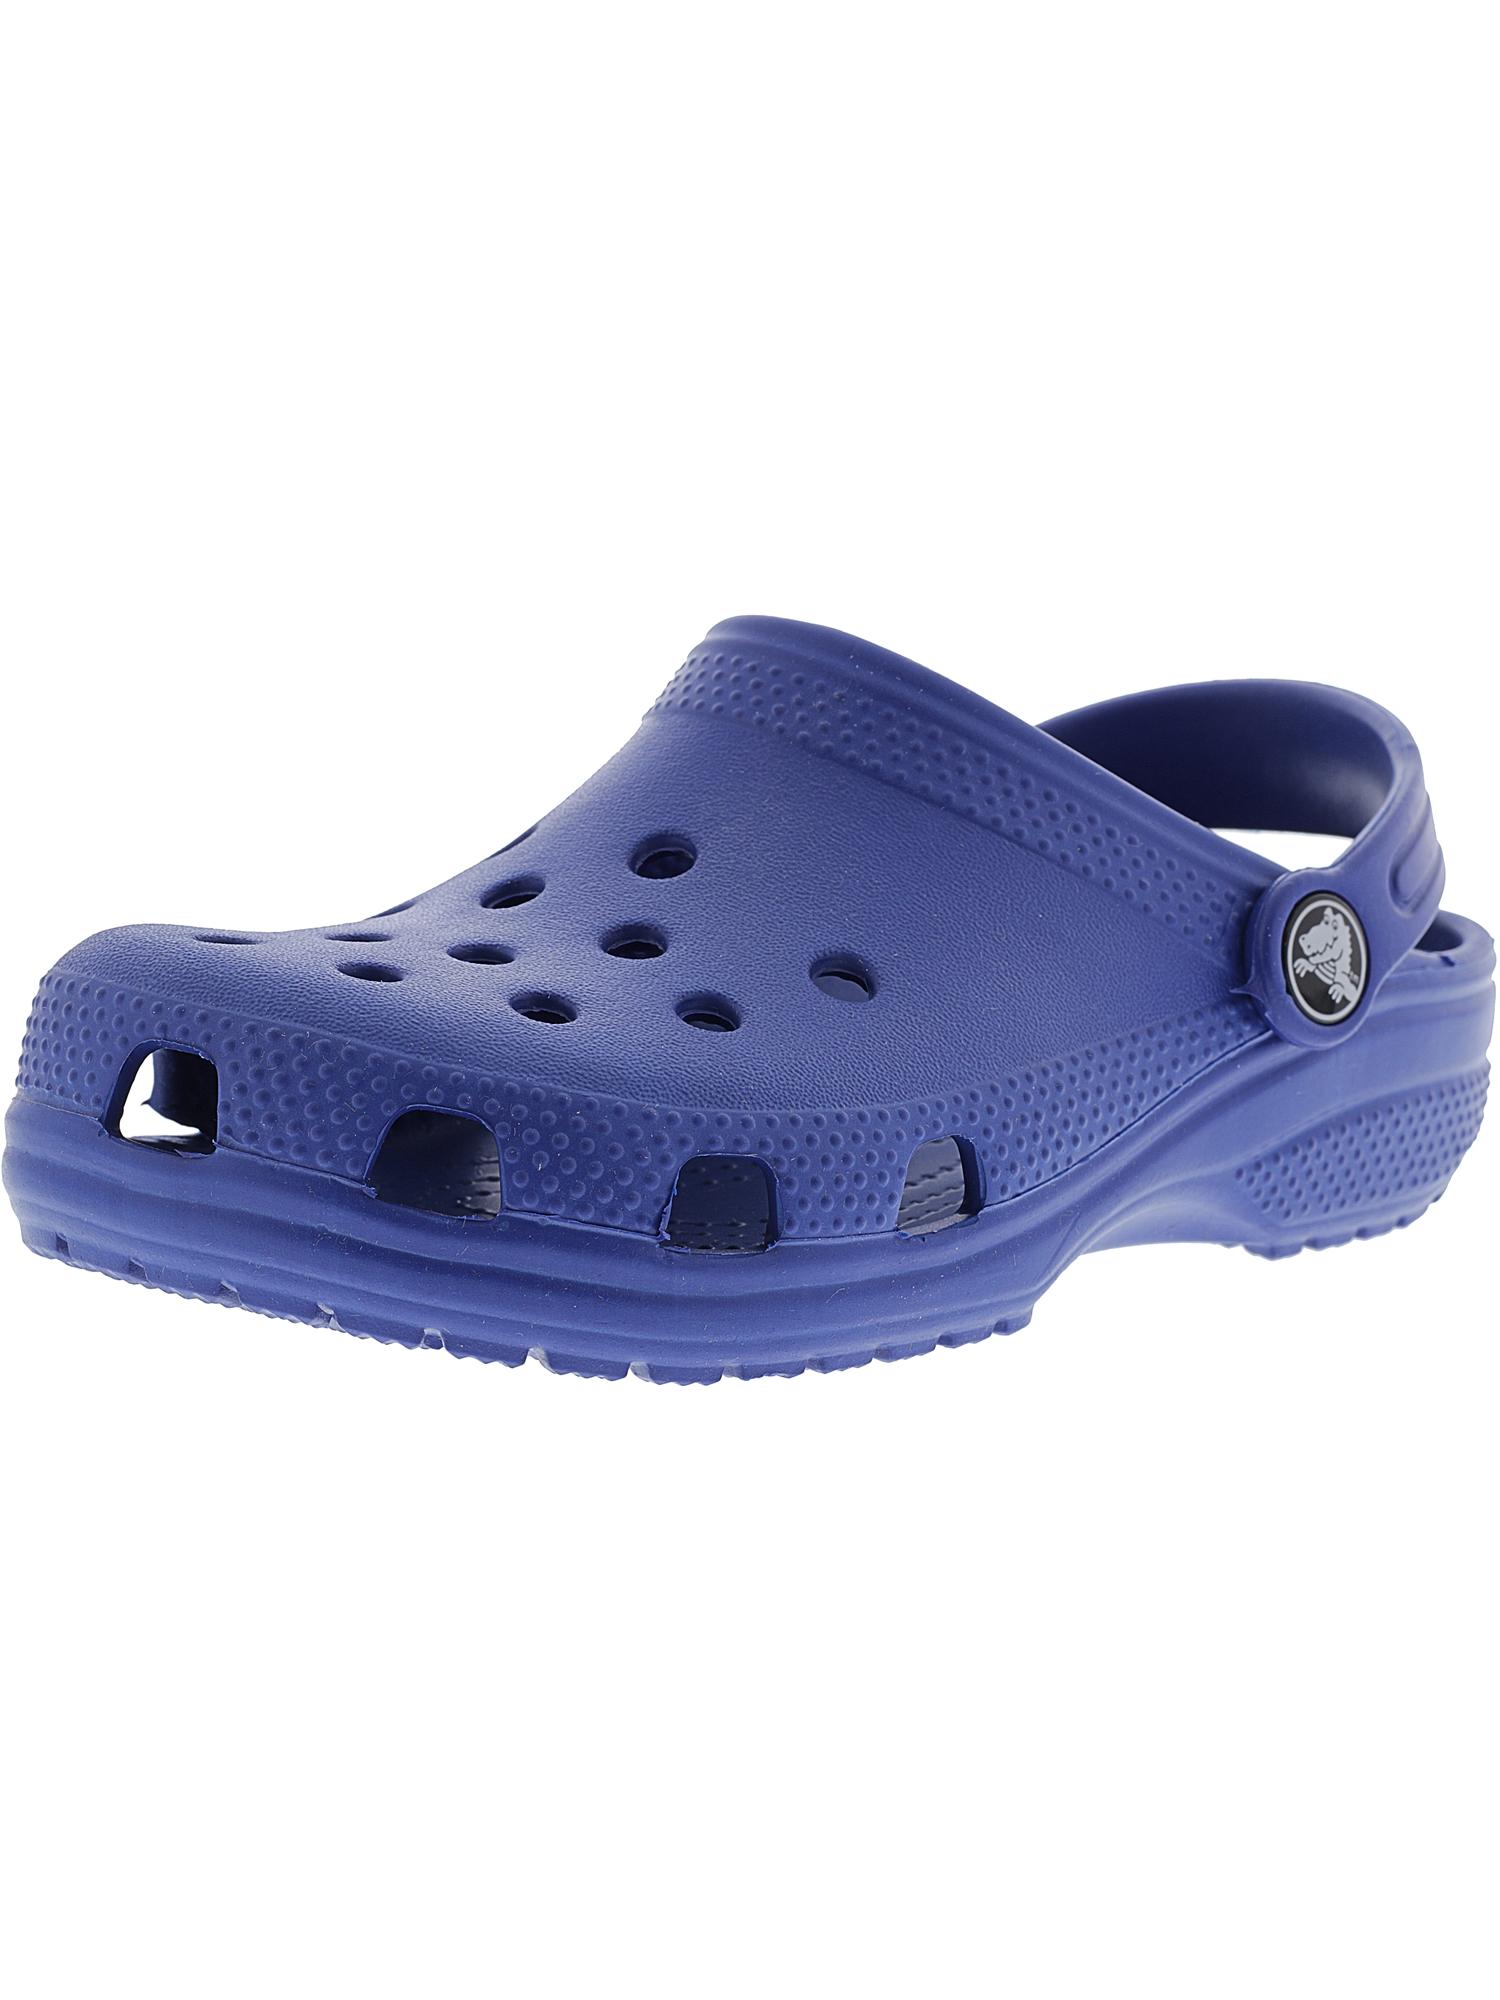 Crocs Kids Classic Clog Ltd Blue Jean Clogs - 6M